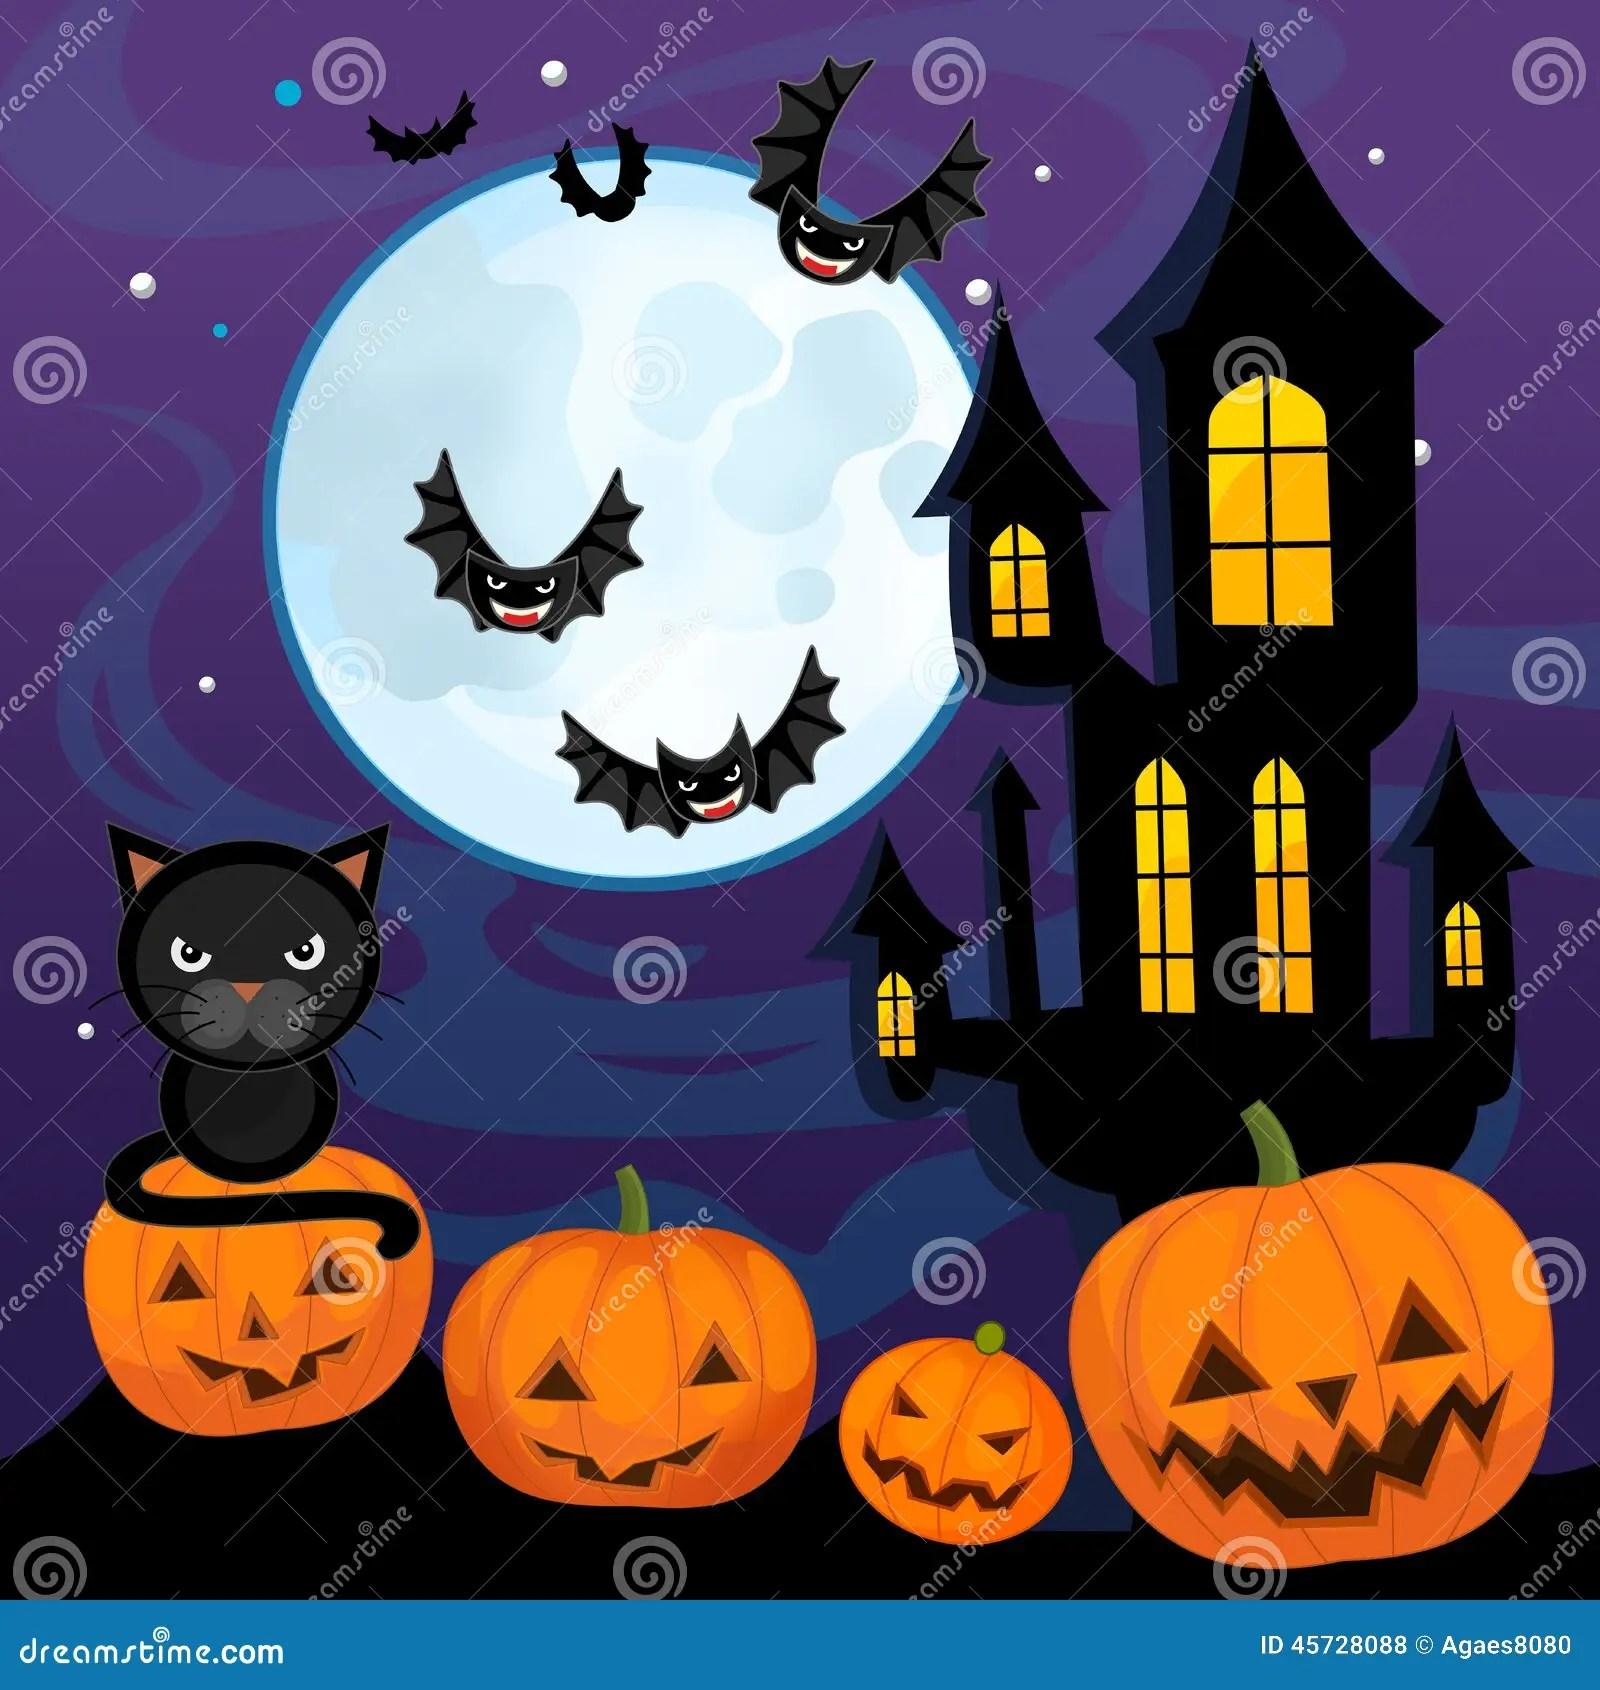 Fall Scenes Wallpaper With Pumpkins Cartoon Halloween Scene Pumpkins By Night Stock